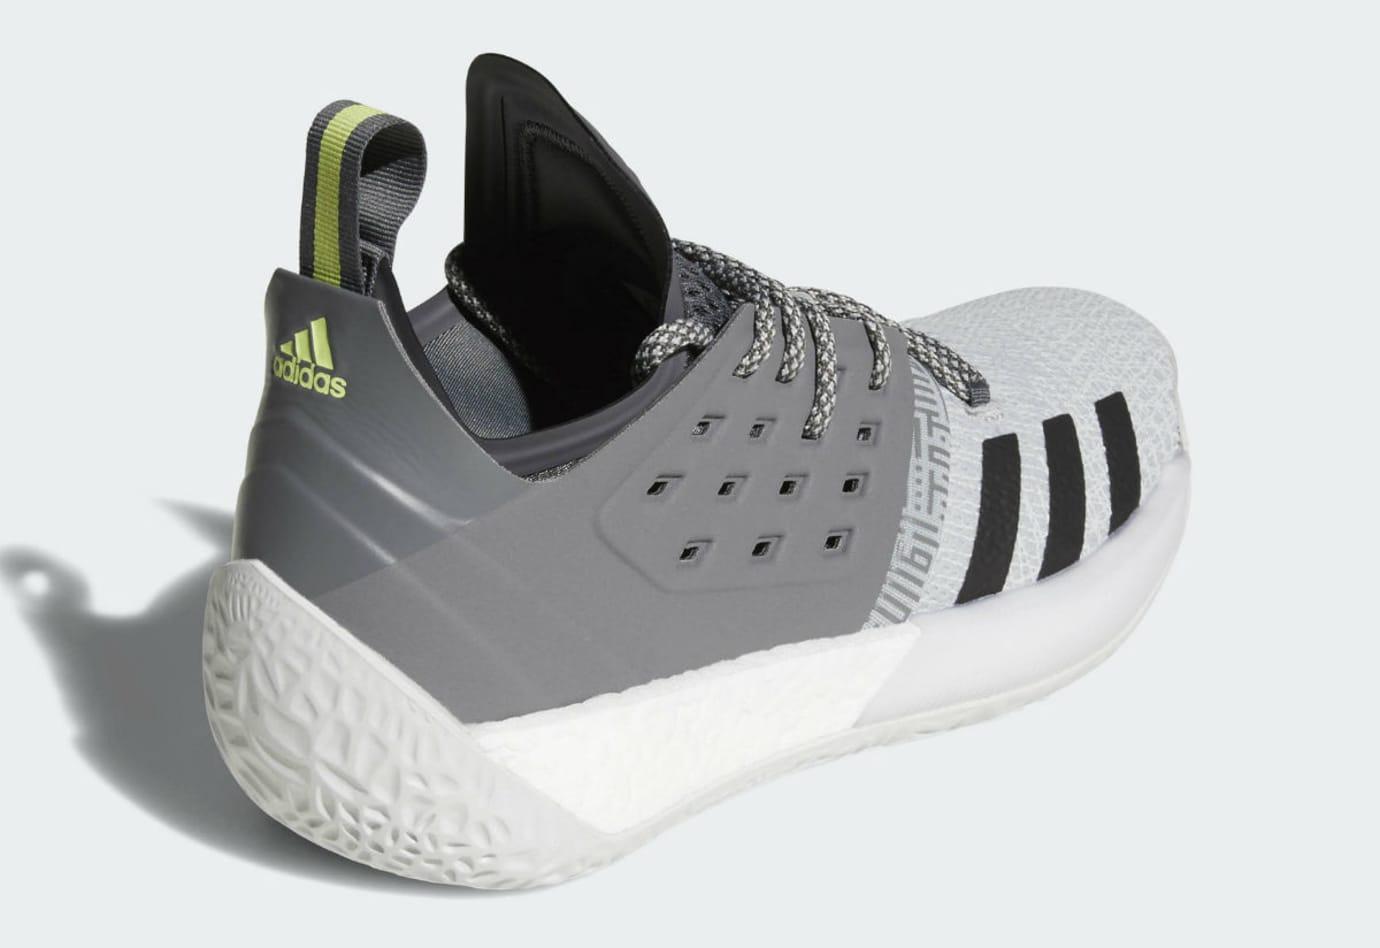 290509788b8529 Adidas Harden Vol. 2 Concrete Grey Release Date AH2122 Black